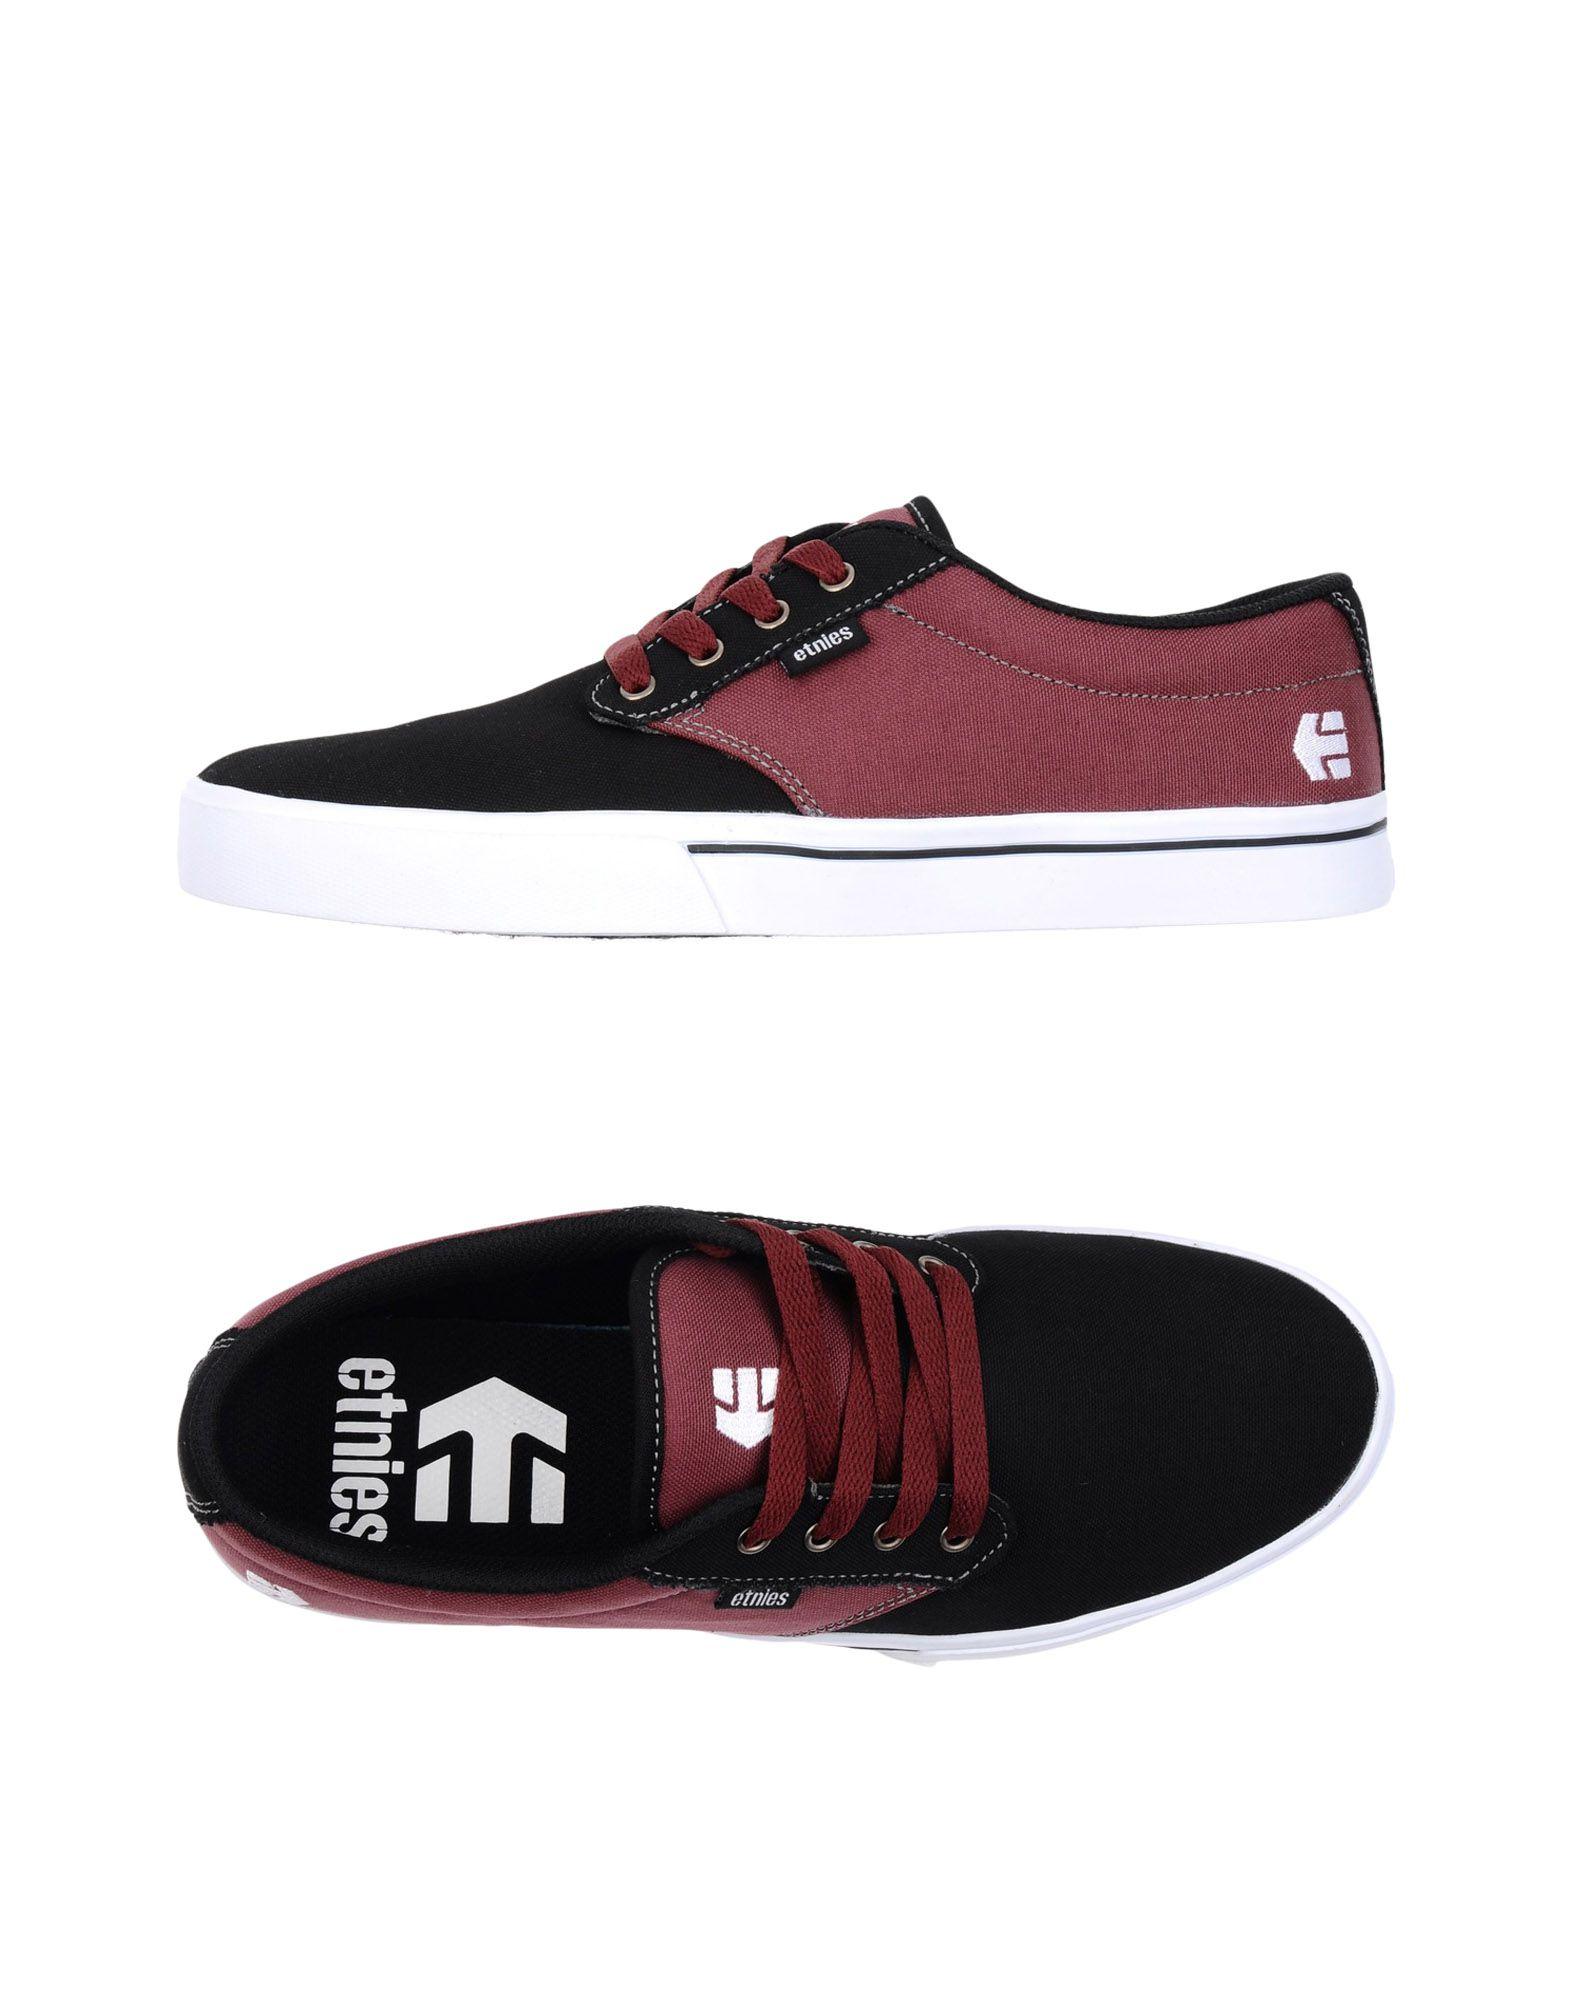 Moda - Sneakers Etnies Uomo - Moda 11341360FM 2bd175